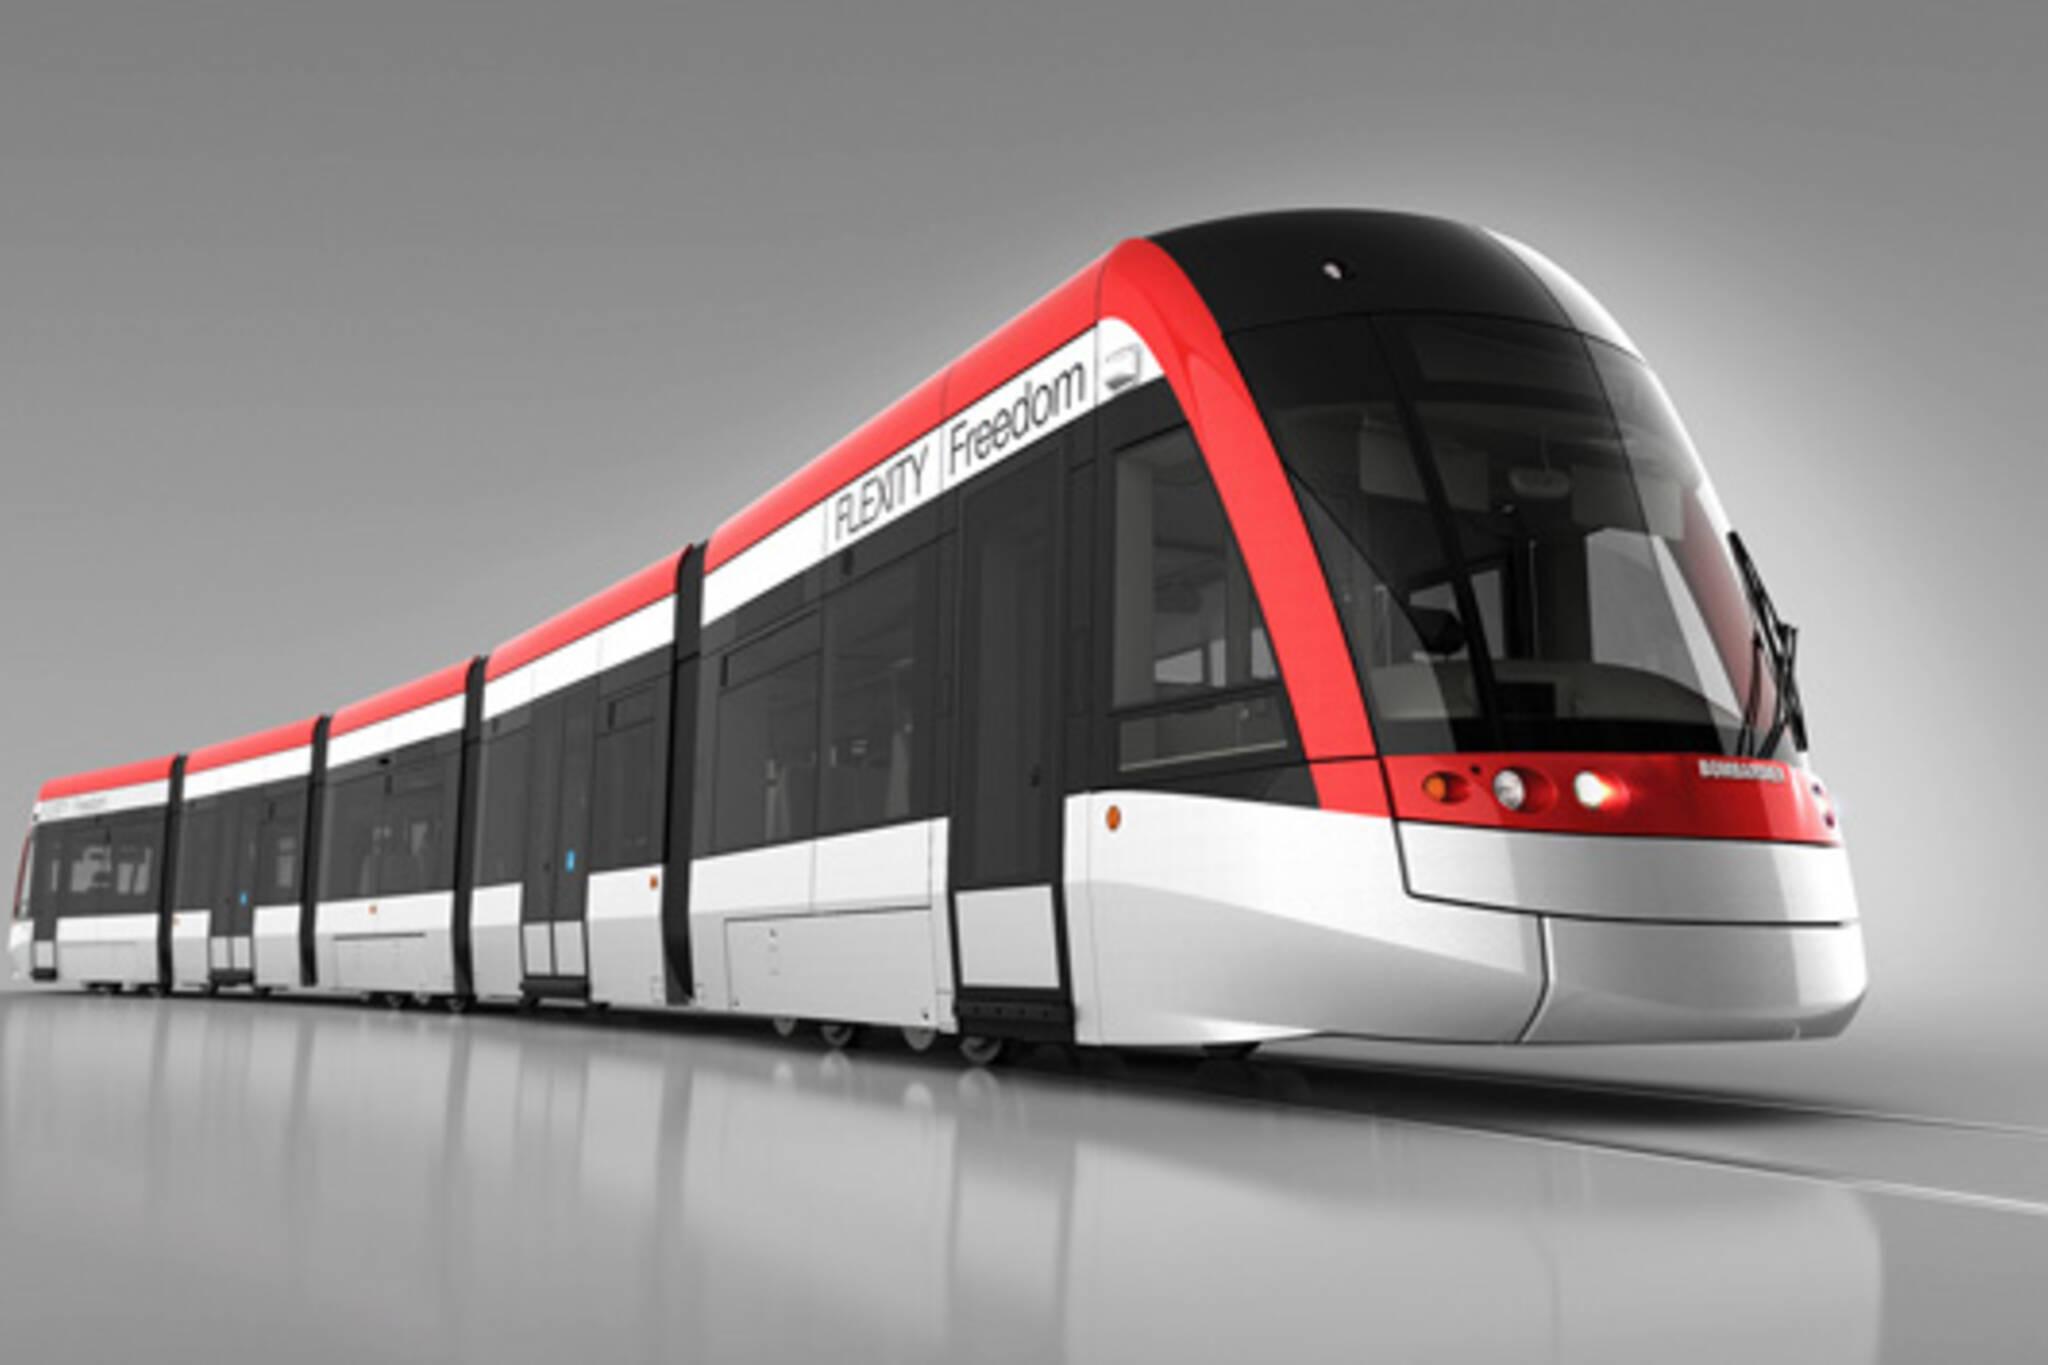 Transit City petition